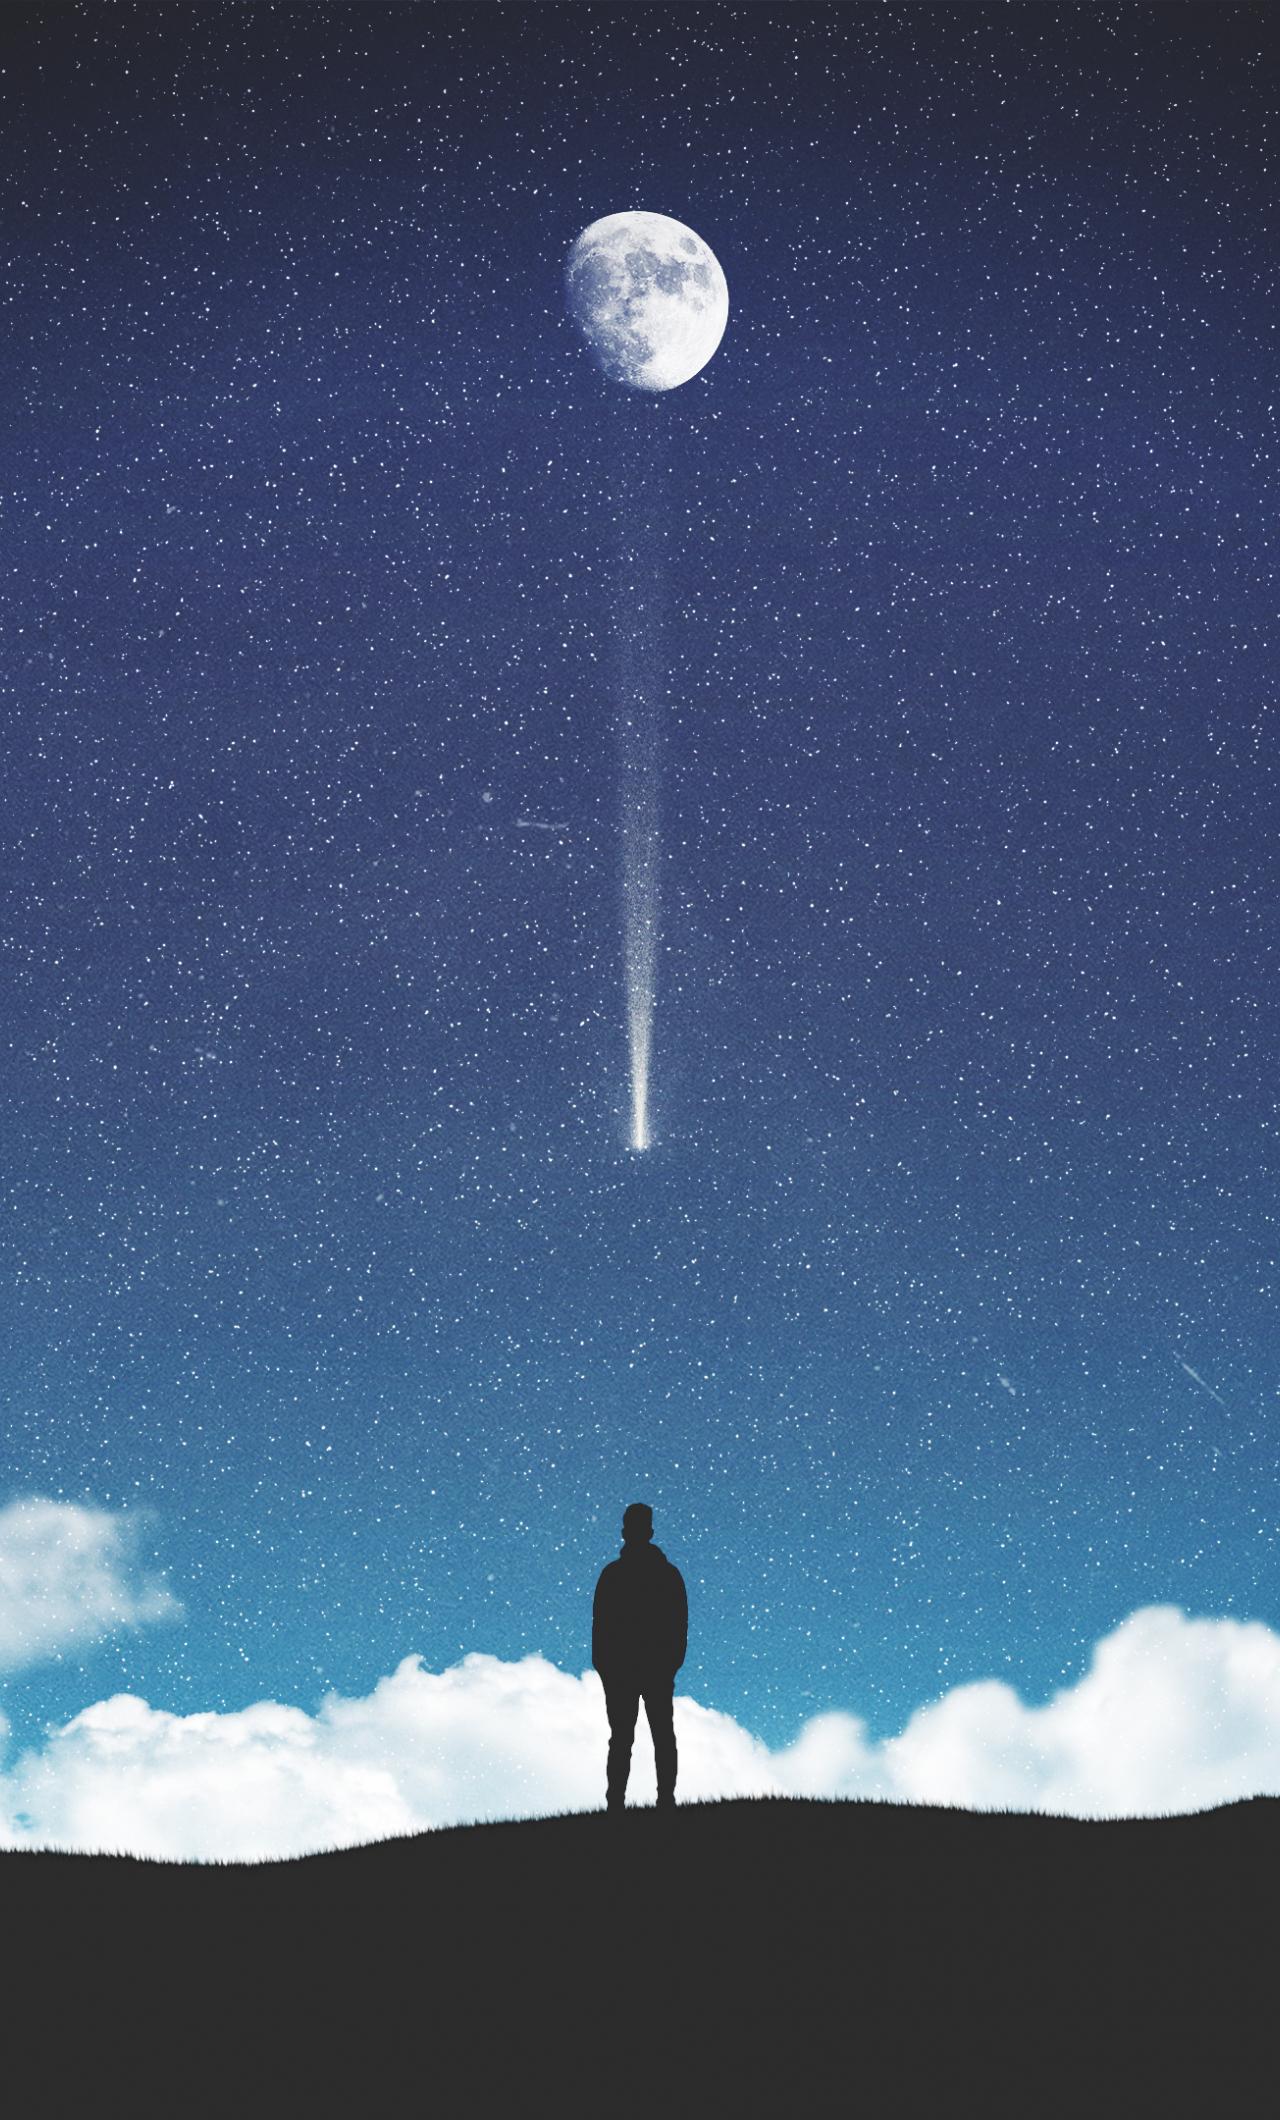 Download 1280x2120 Wallpaper Moon Starry Sky Silhouette